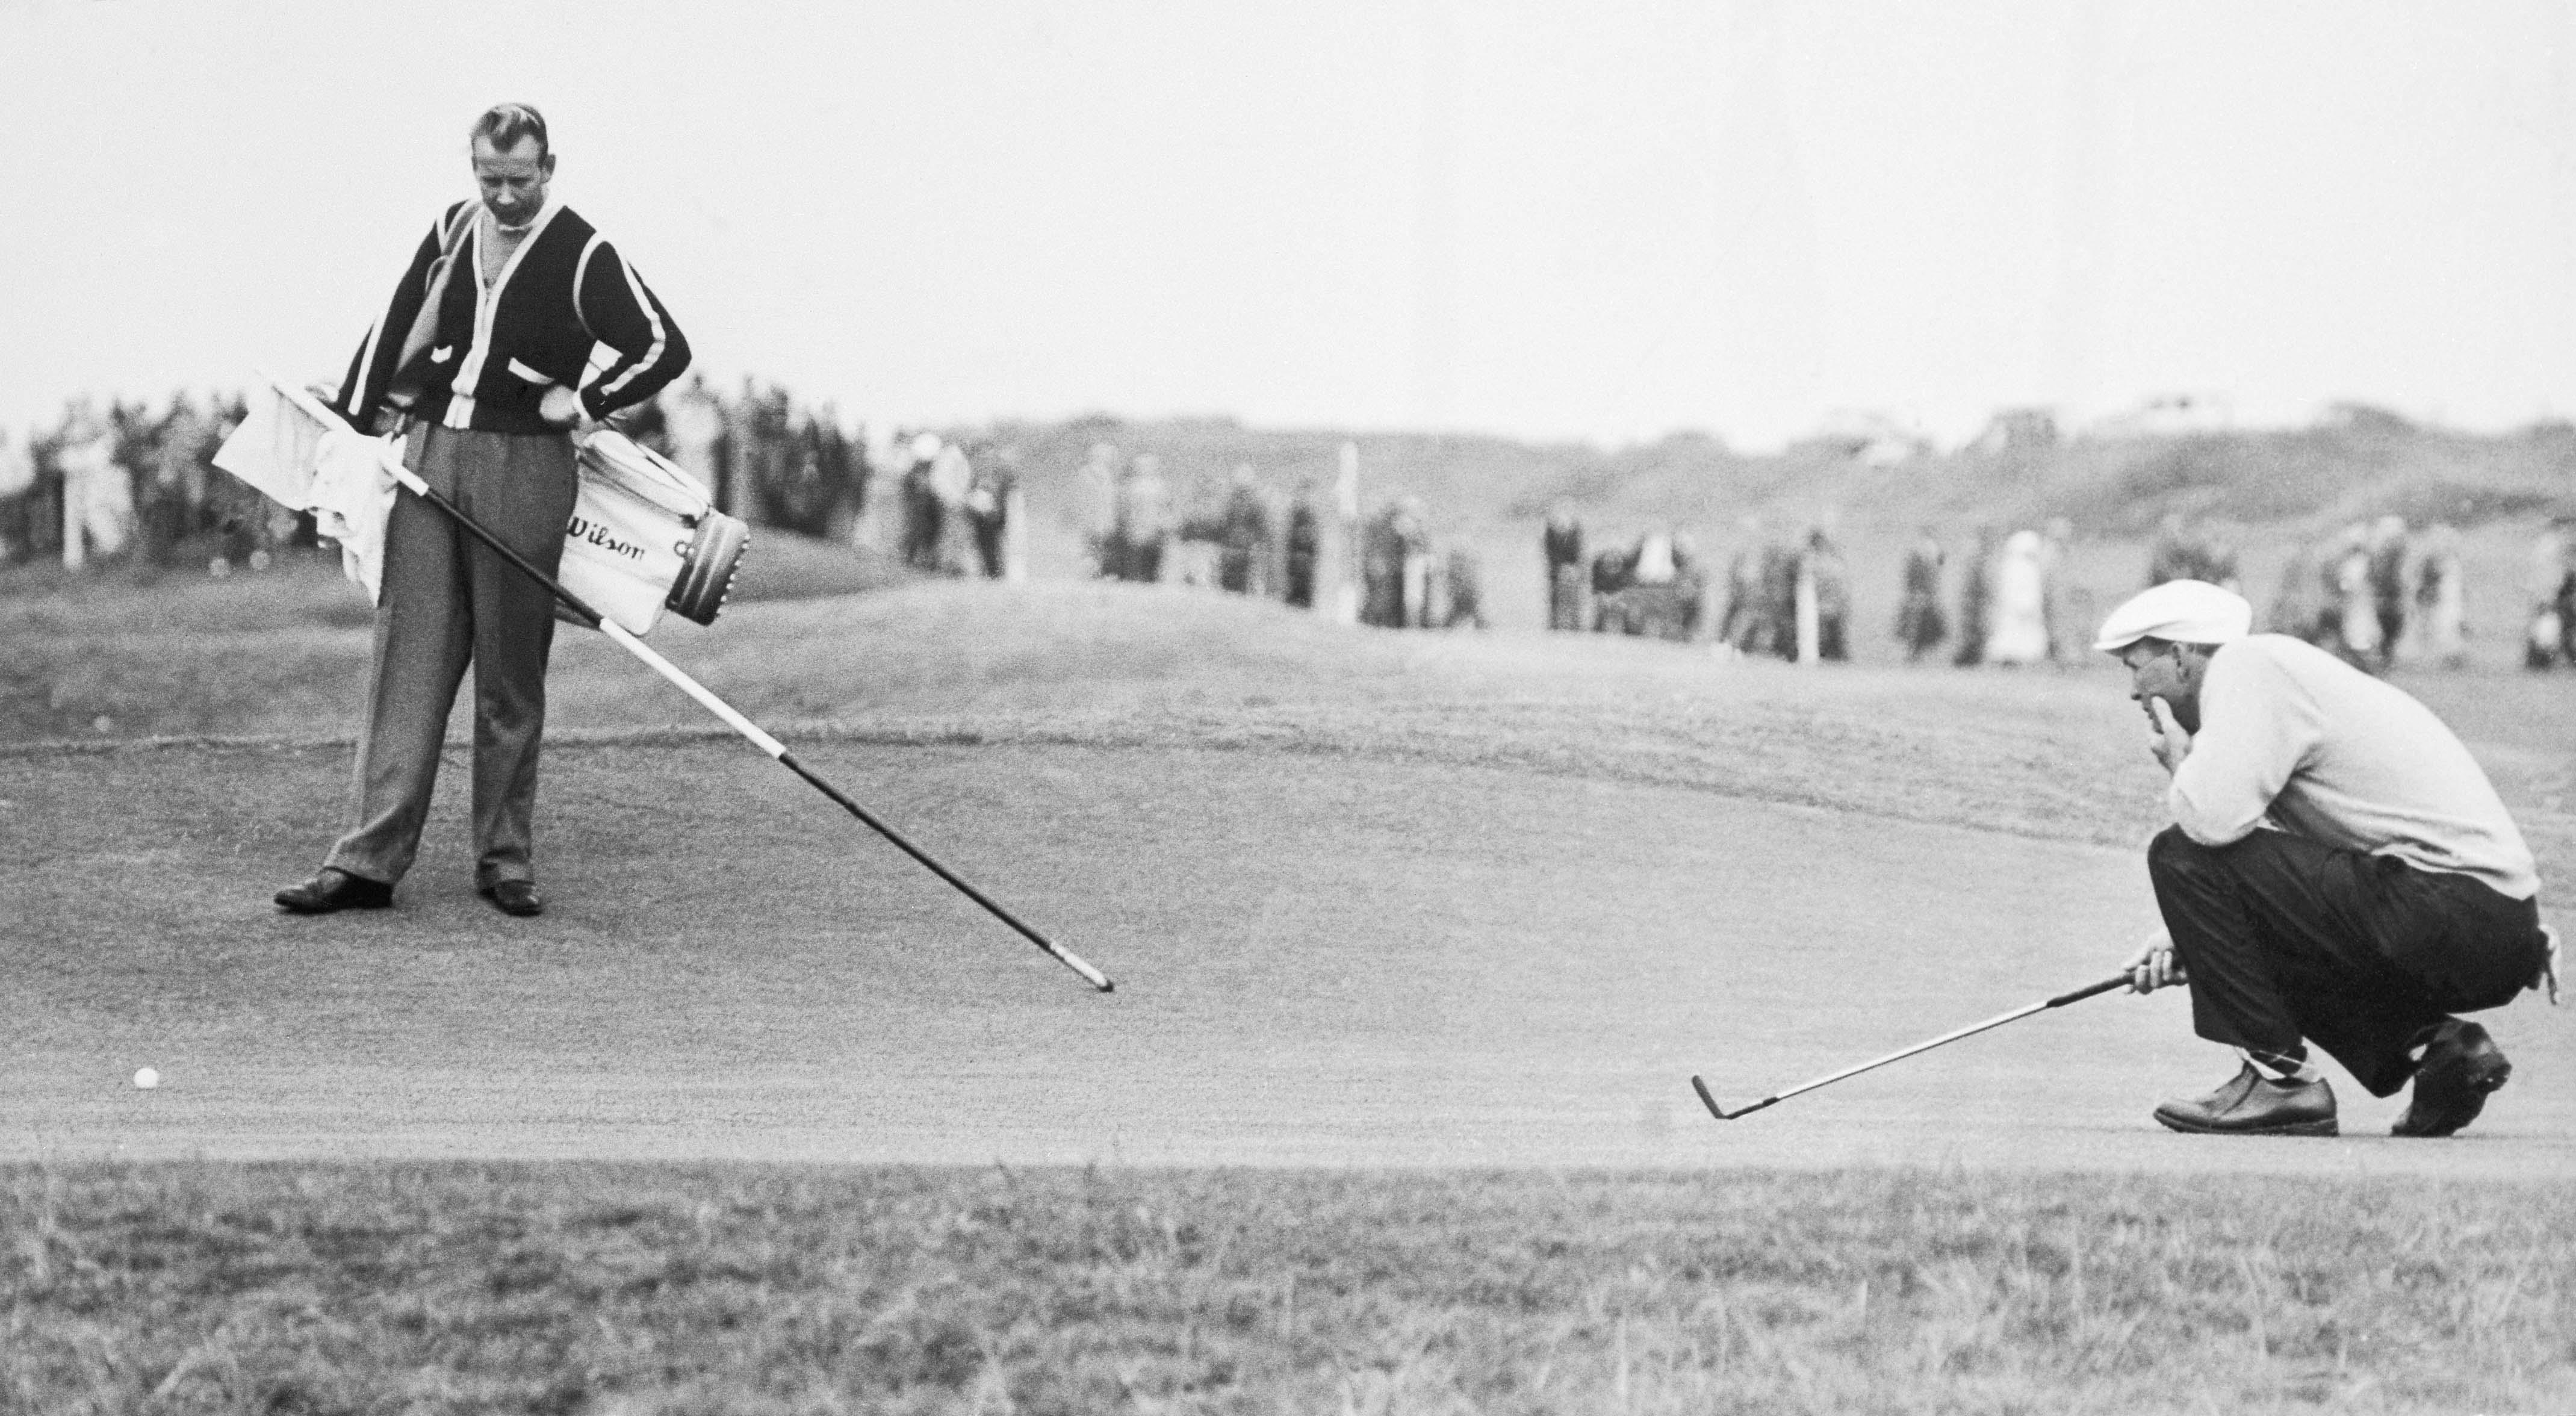 8. 1960: Arnie crosses the pond